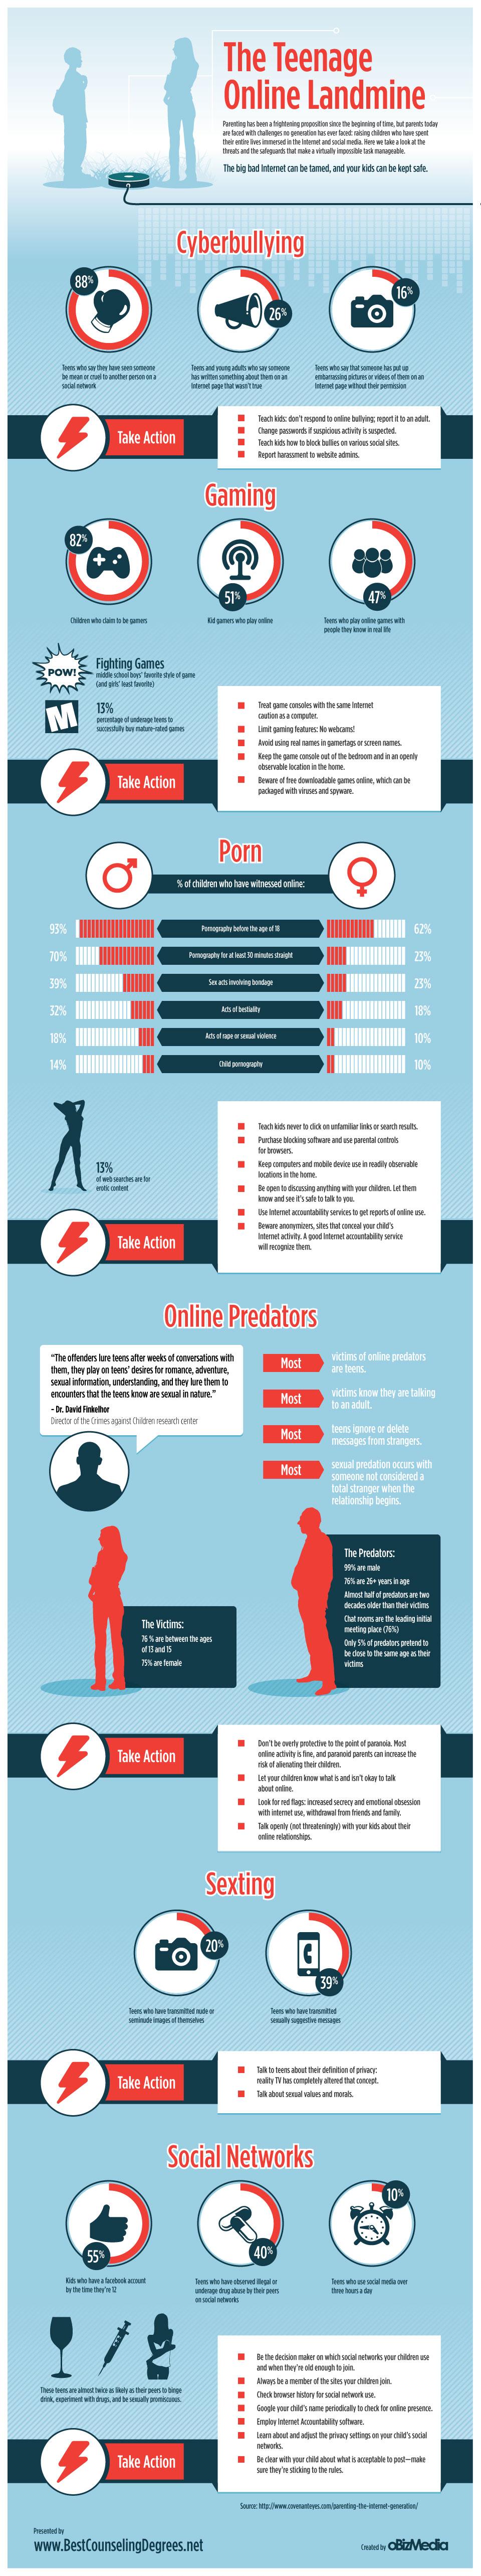 The Teenage Online Landmine